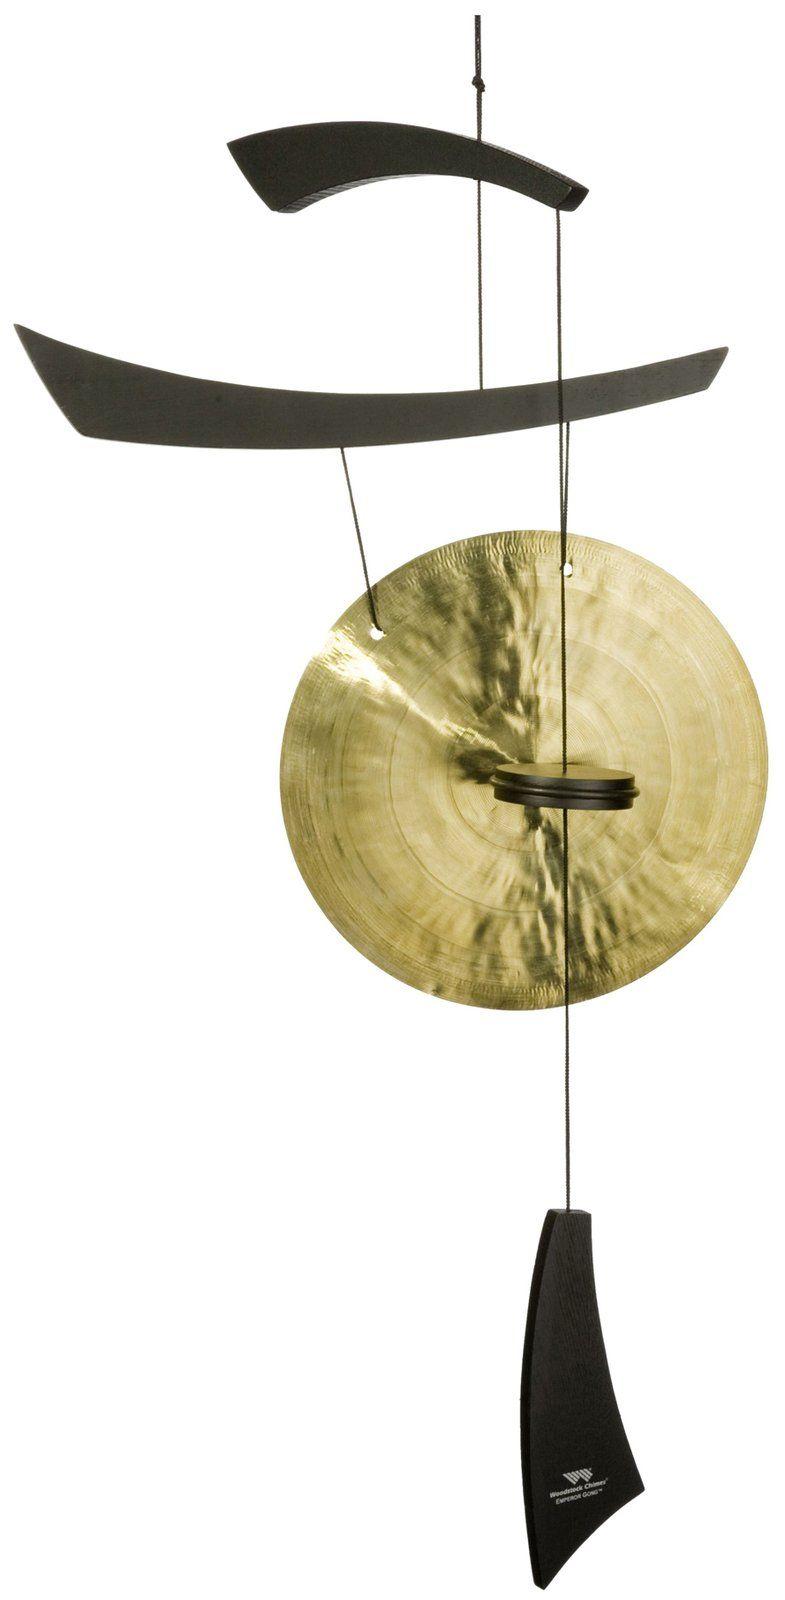 Emperor Medium Gong Black Wood Casa Com Windspiele Klangspiel Garten